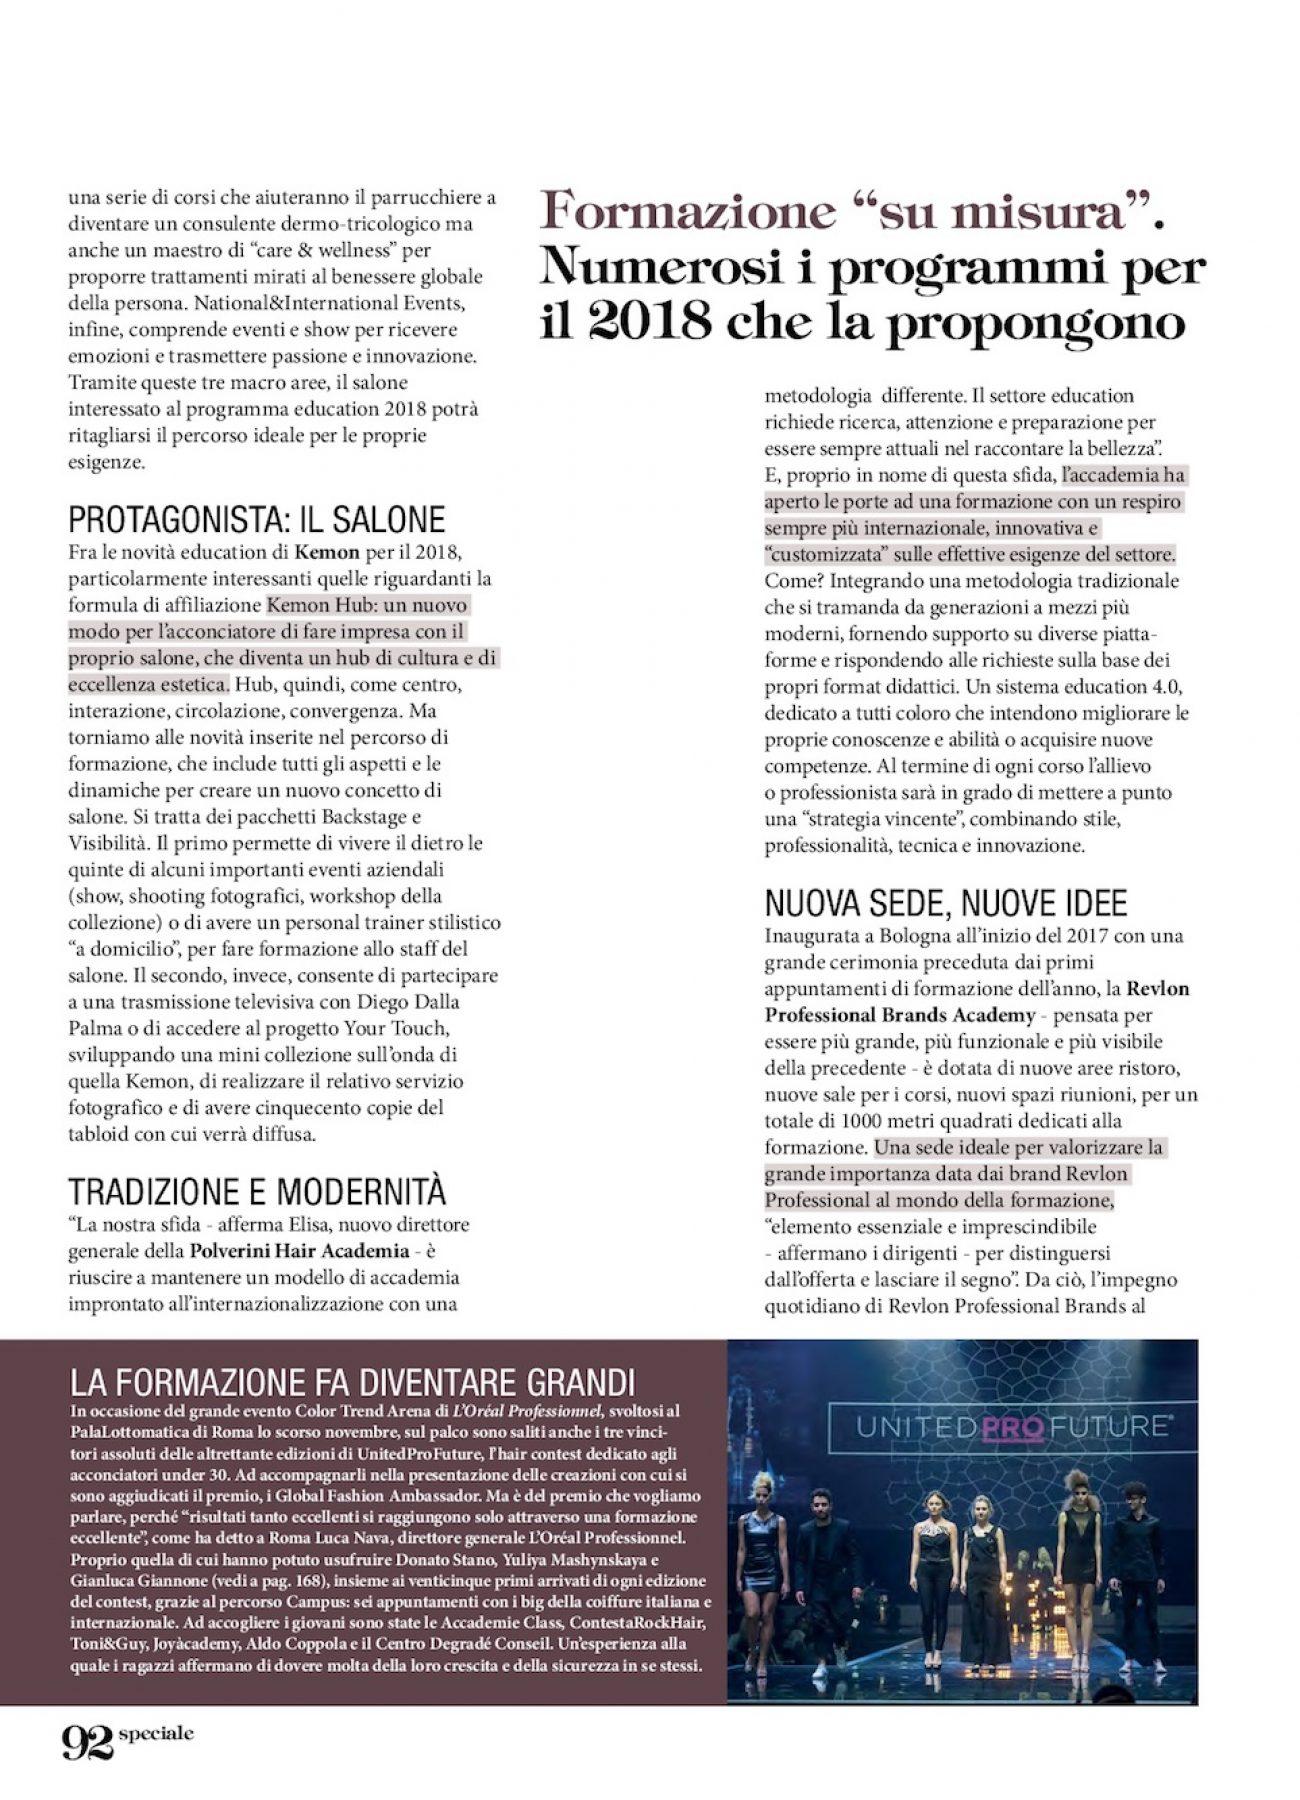 http://www.polverinihairacademia.com/wp-content/uploads/2018/02/Estetica_-pag-94-001-1300x1800.jpg